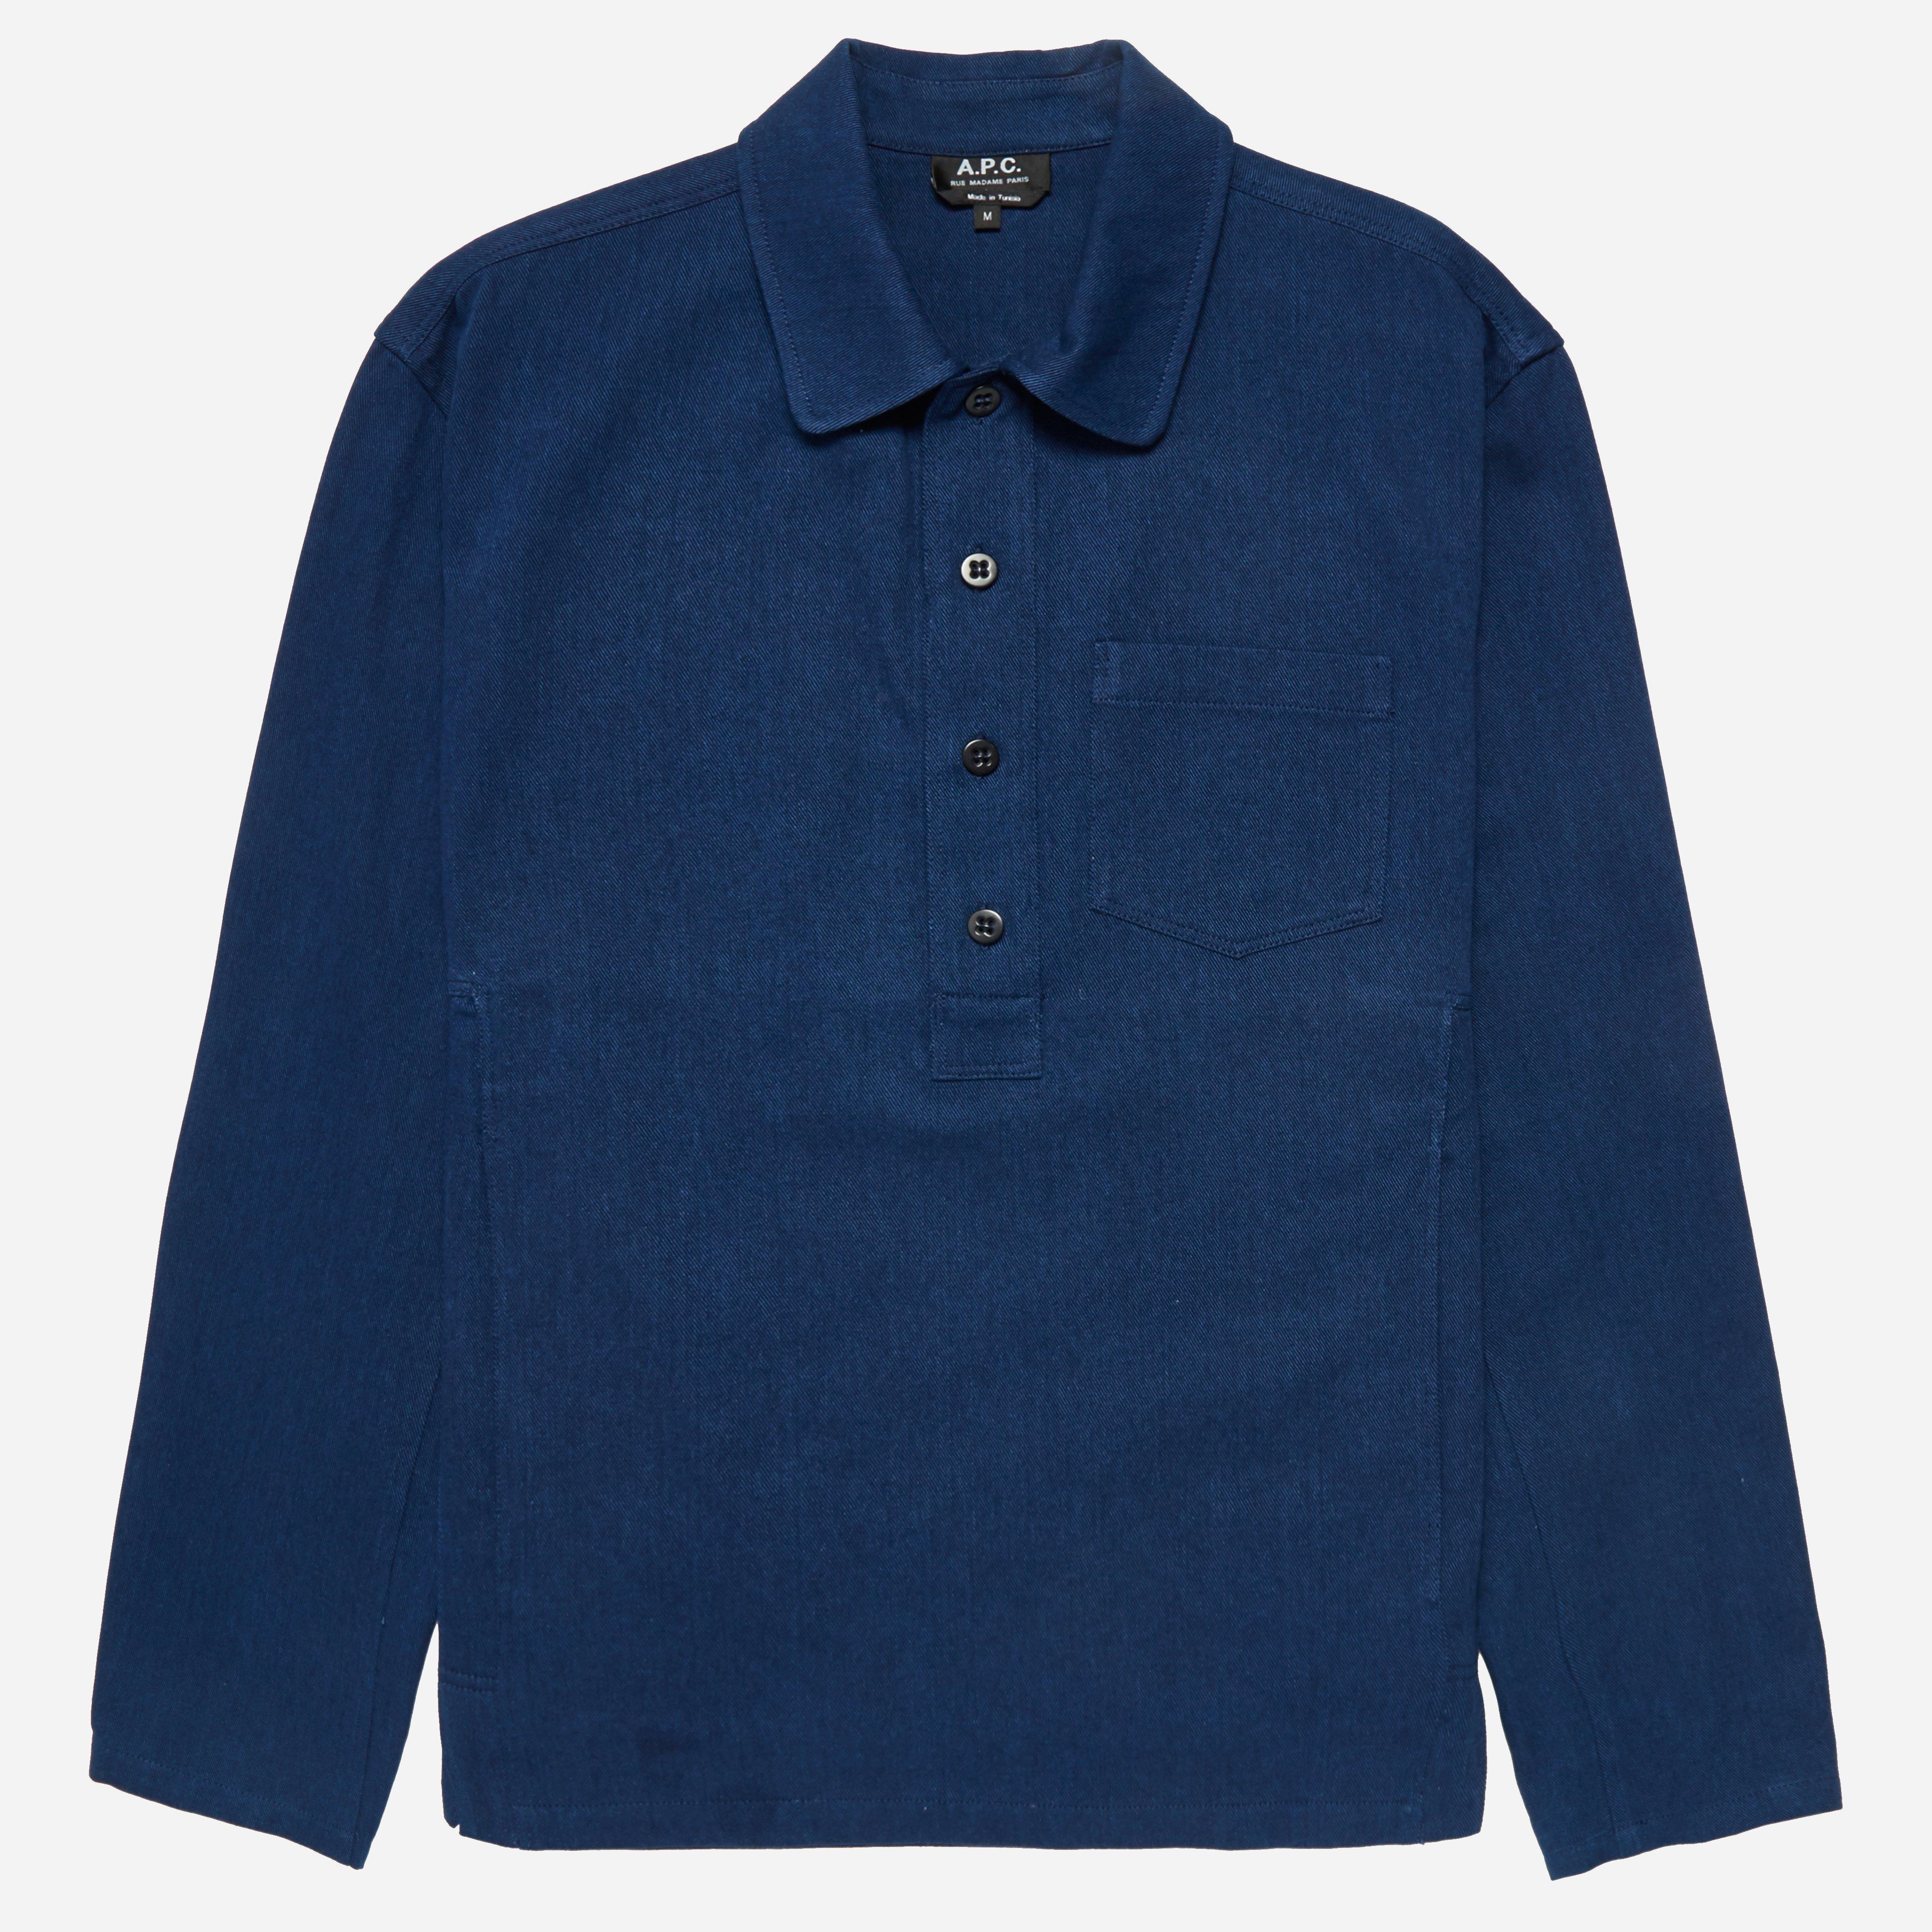 A.P.C. Haddock Shirt